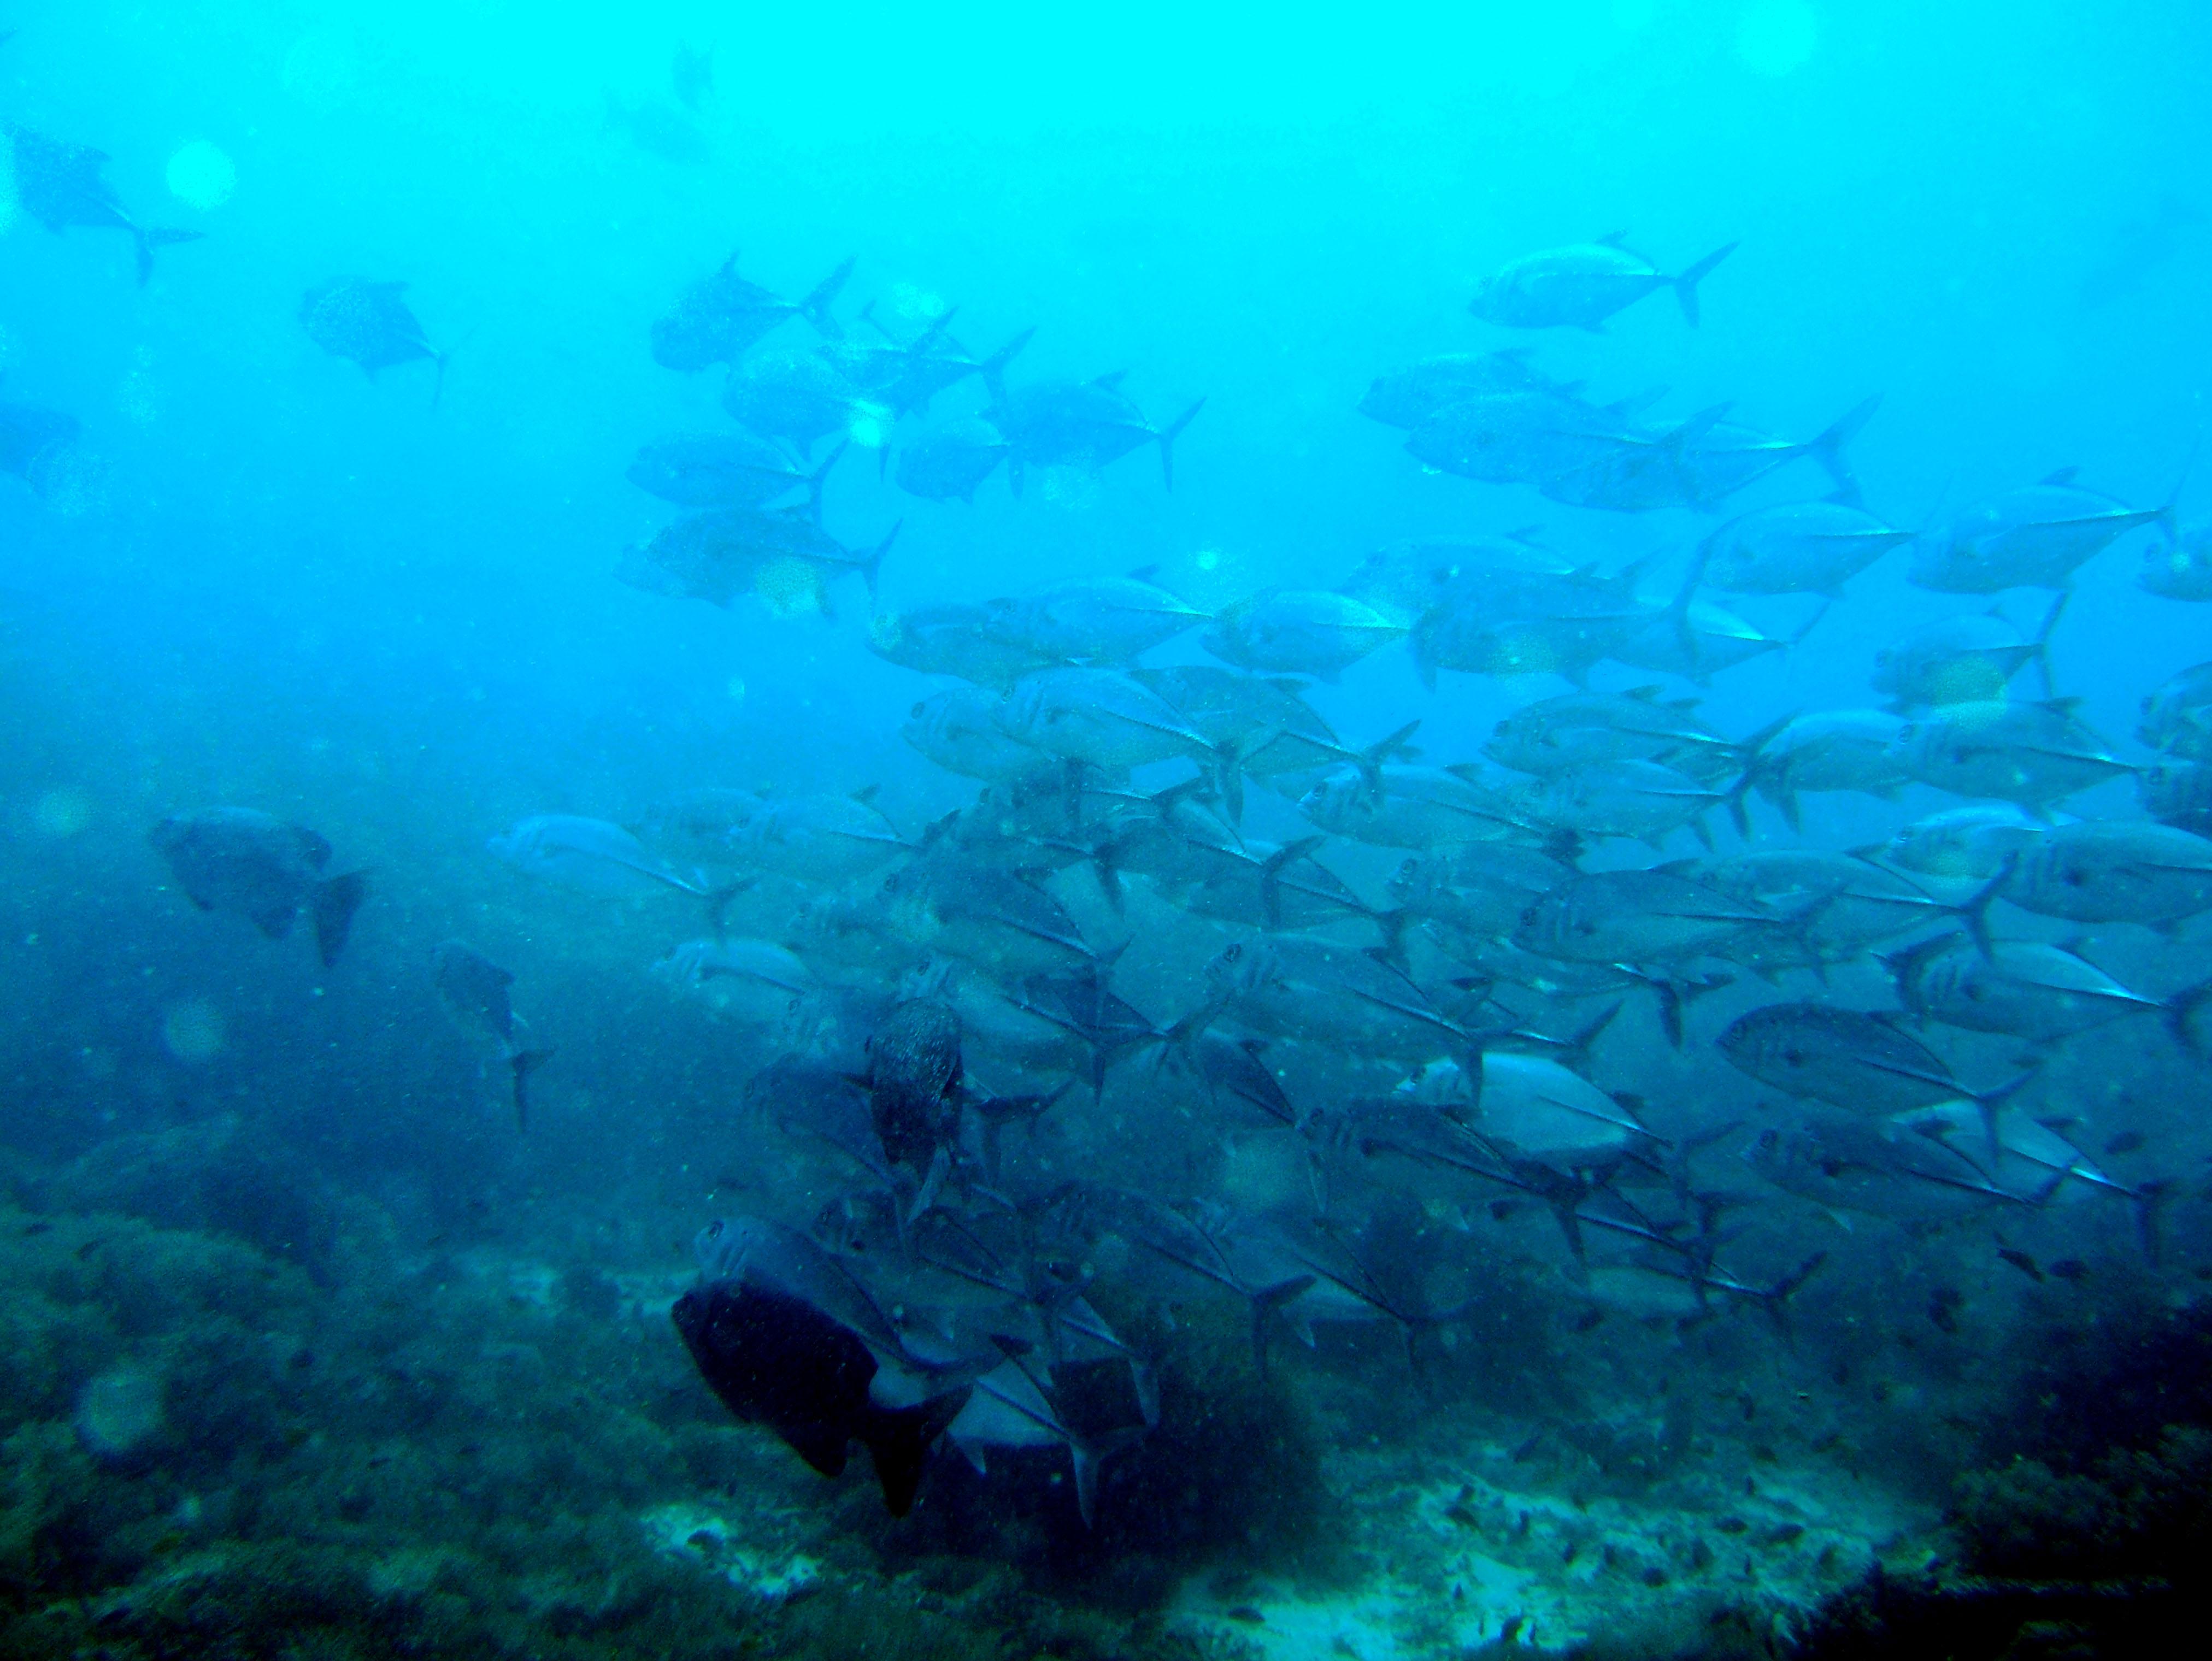 Philippines Cebu Bohol Balicasag Island Black Forest dive Dec 2005 03